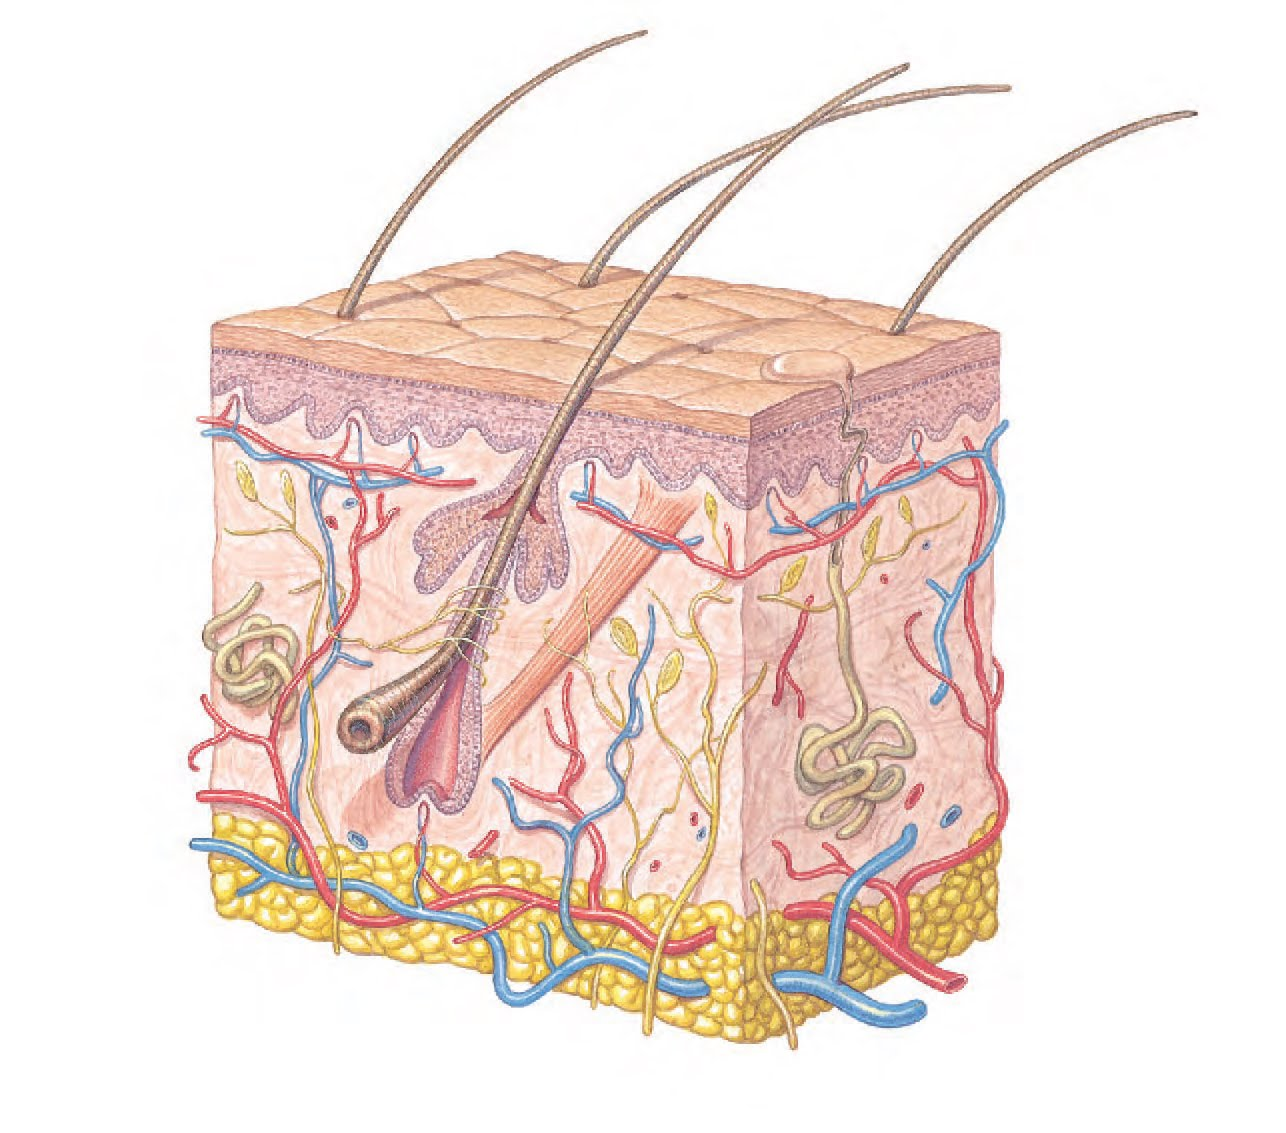 Anatoma Fisiolgica de la Glndula Mamaria - La Mancha